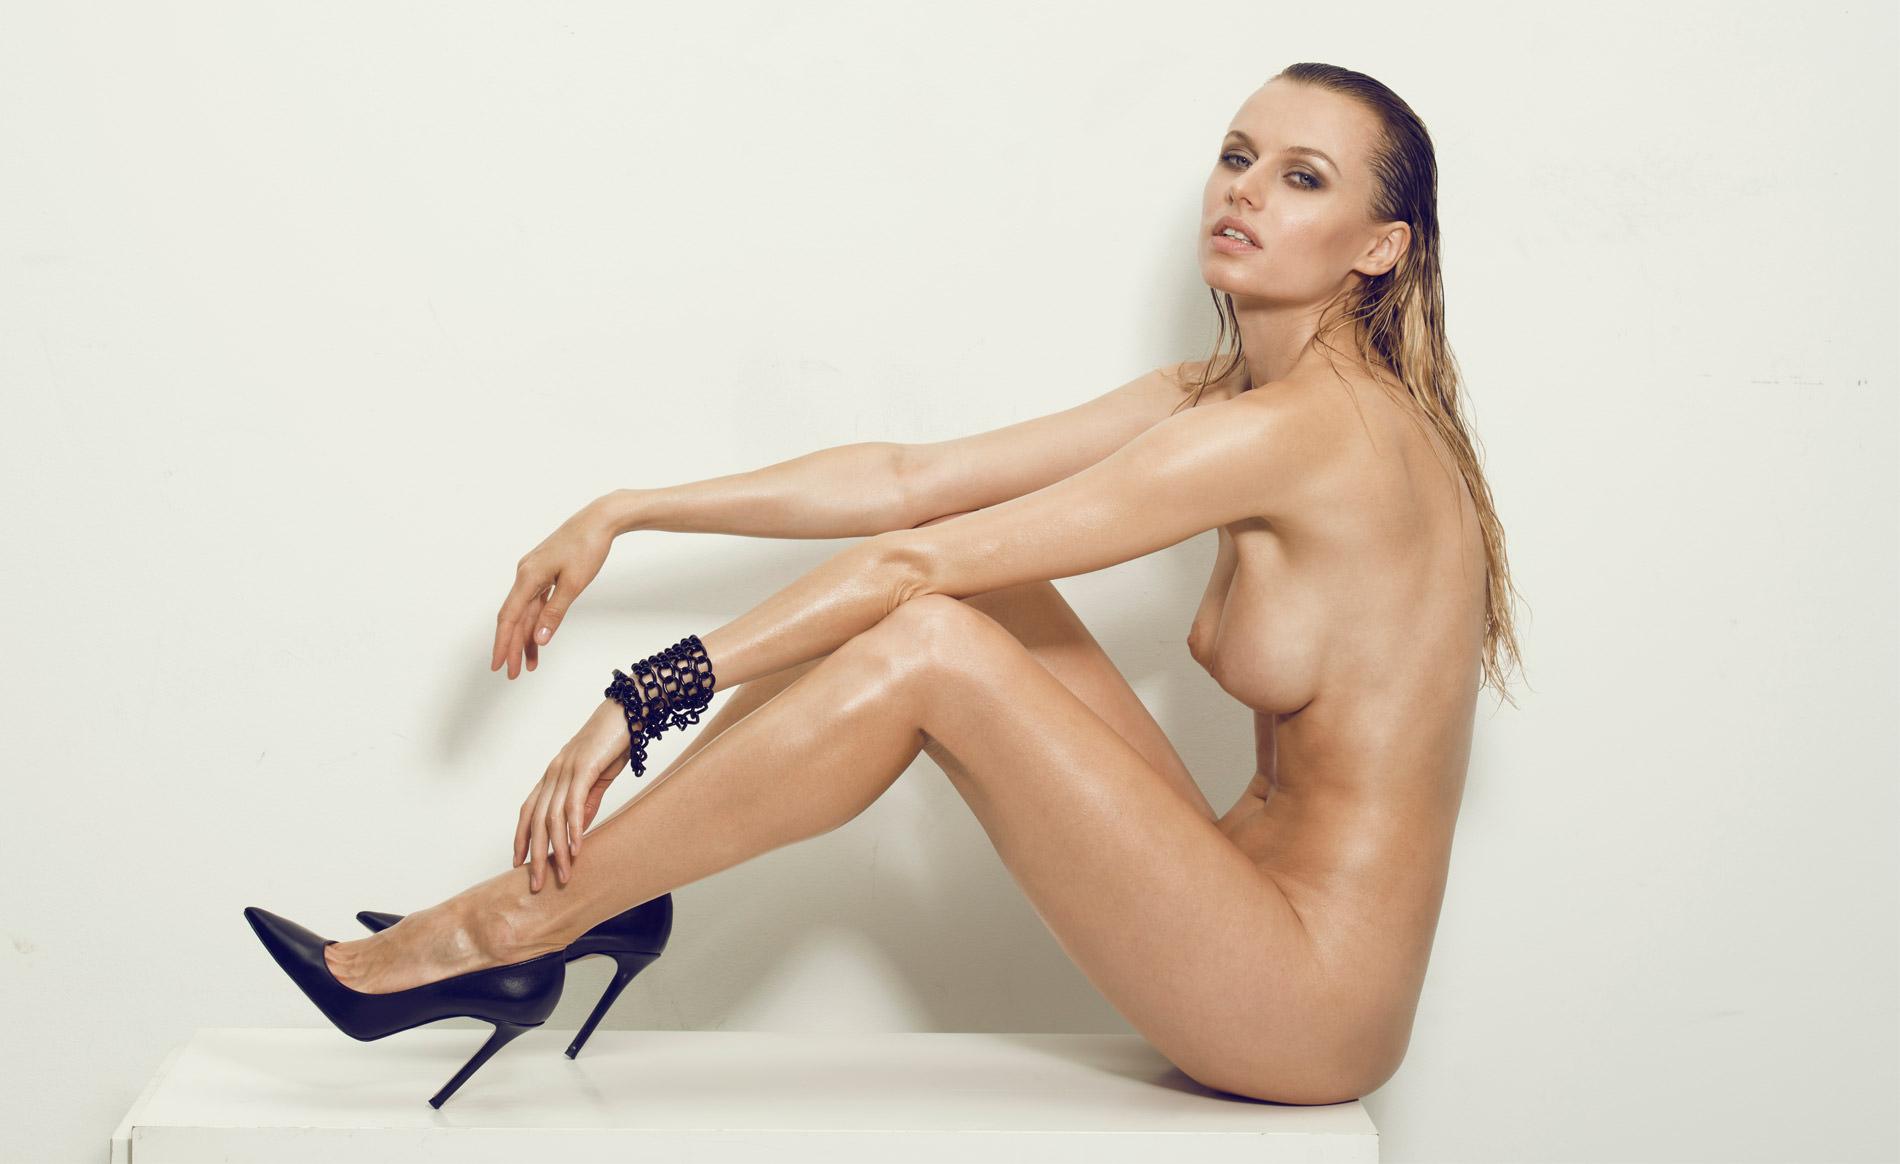 Booty Christine Richters nudes (46 photos), Pussy, Bikini, Twitter, swimsuit 2020